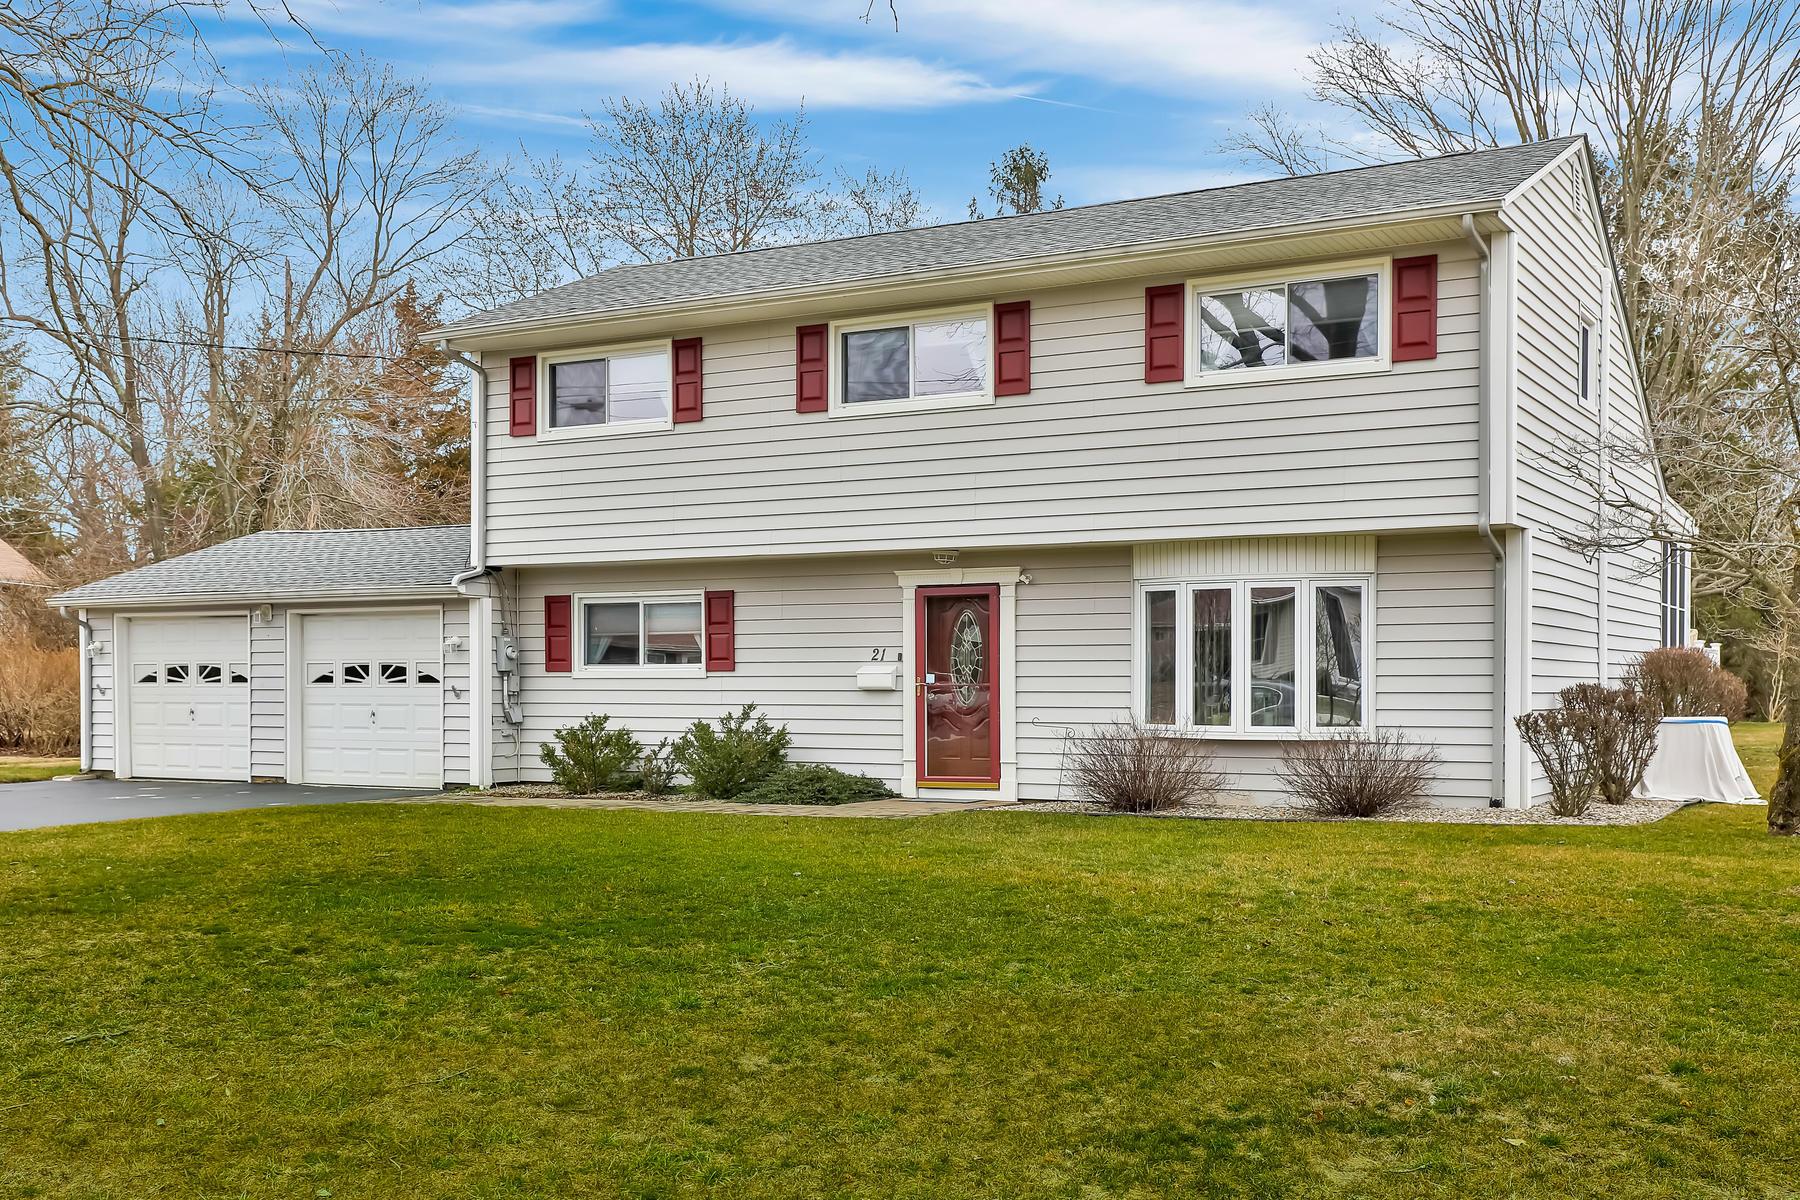 Single Family Homes vì Bán tại Move-In Ready and Great Location! 21 Bernard Street, Eatontown, New Jersey 07724 Hoa Kỳ